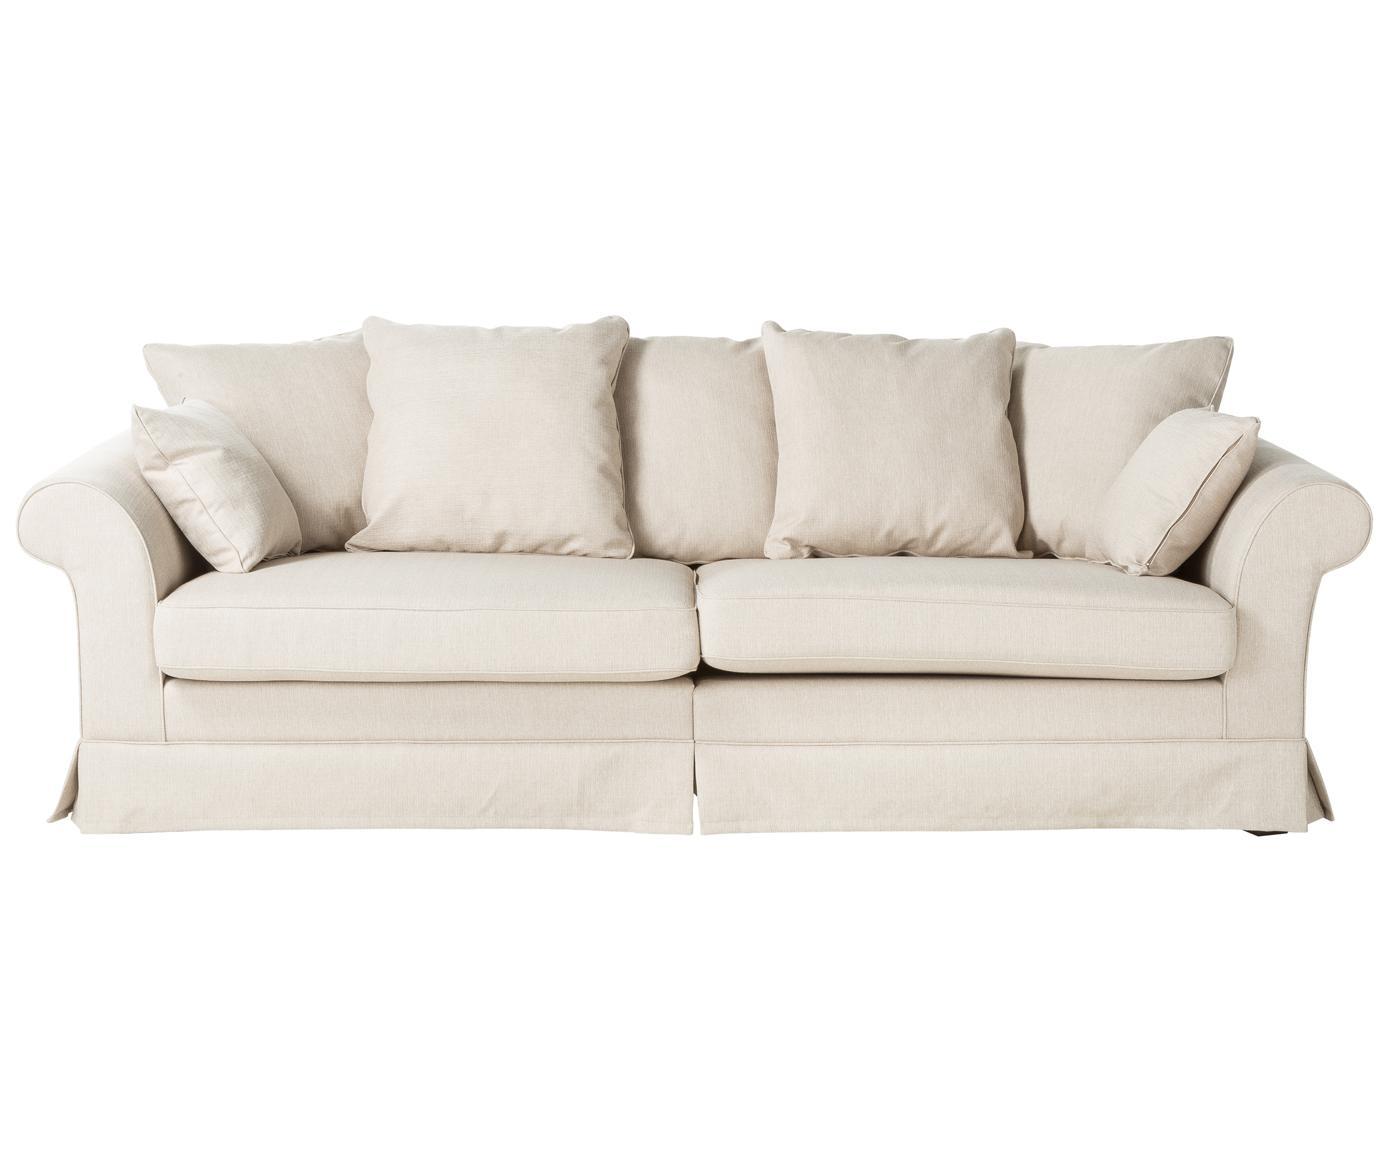 Grote bank Nobis, Bekleding: polyester, Crèmekleurig, B 264 x D 111 cm